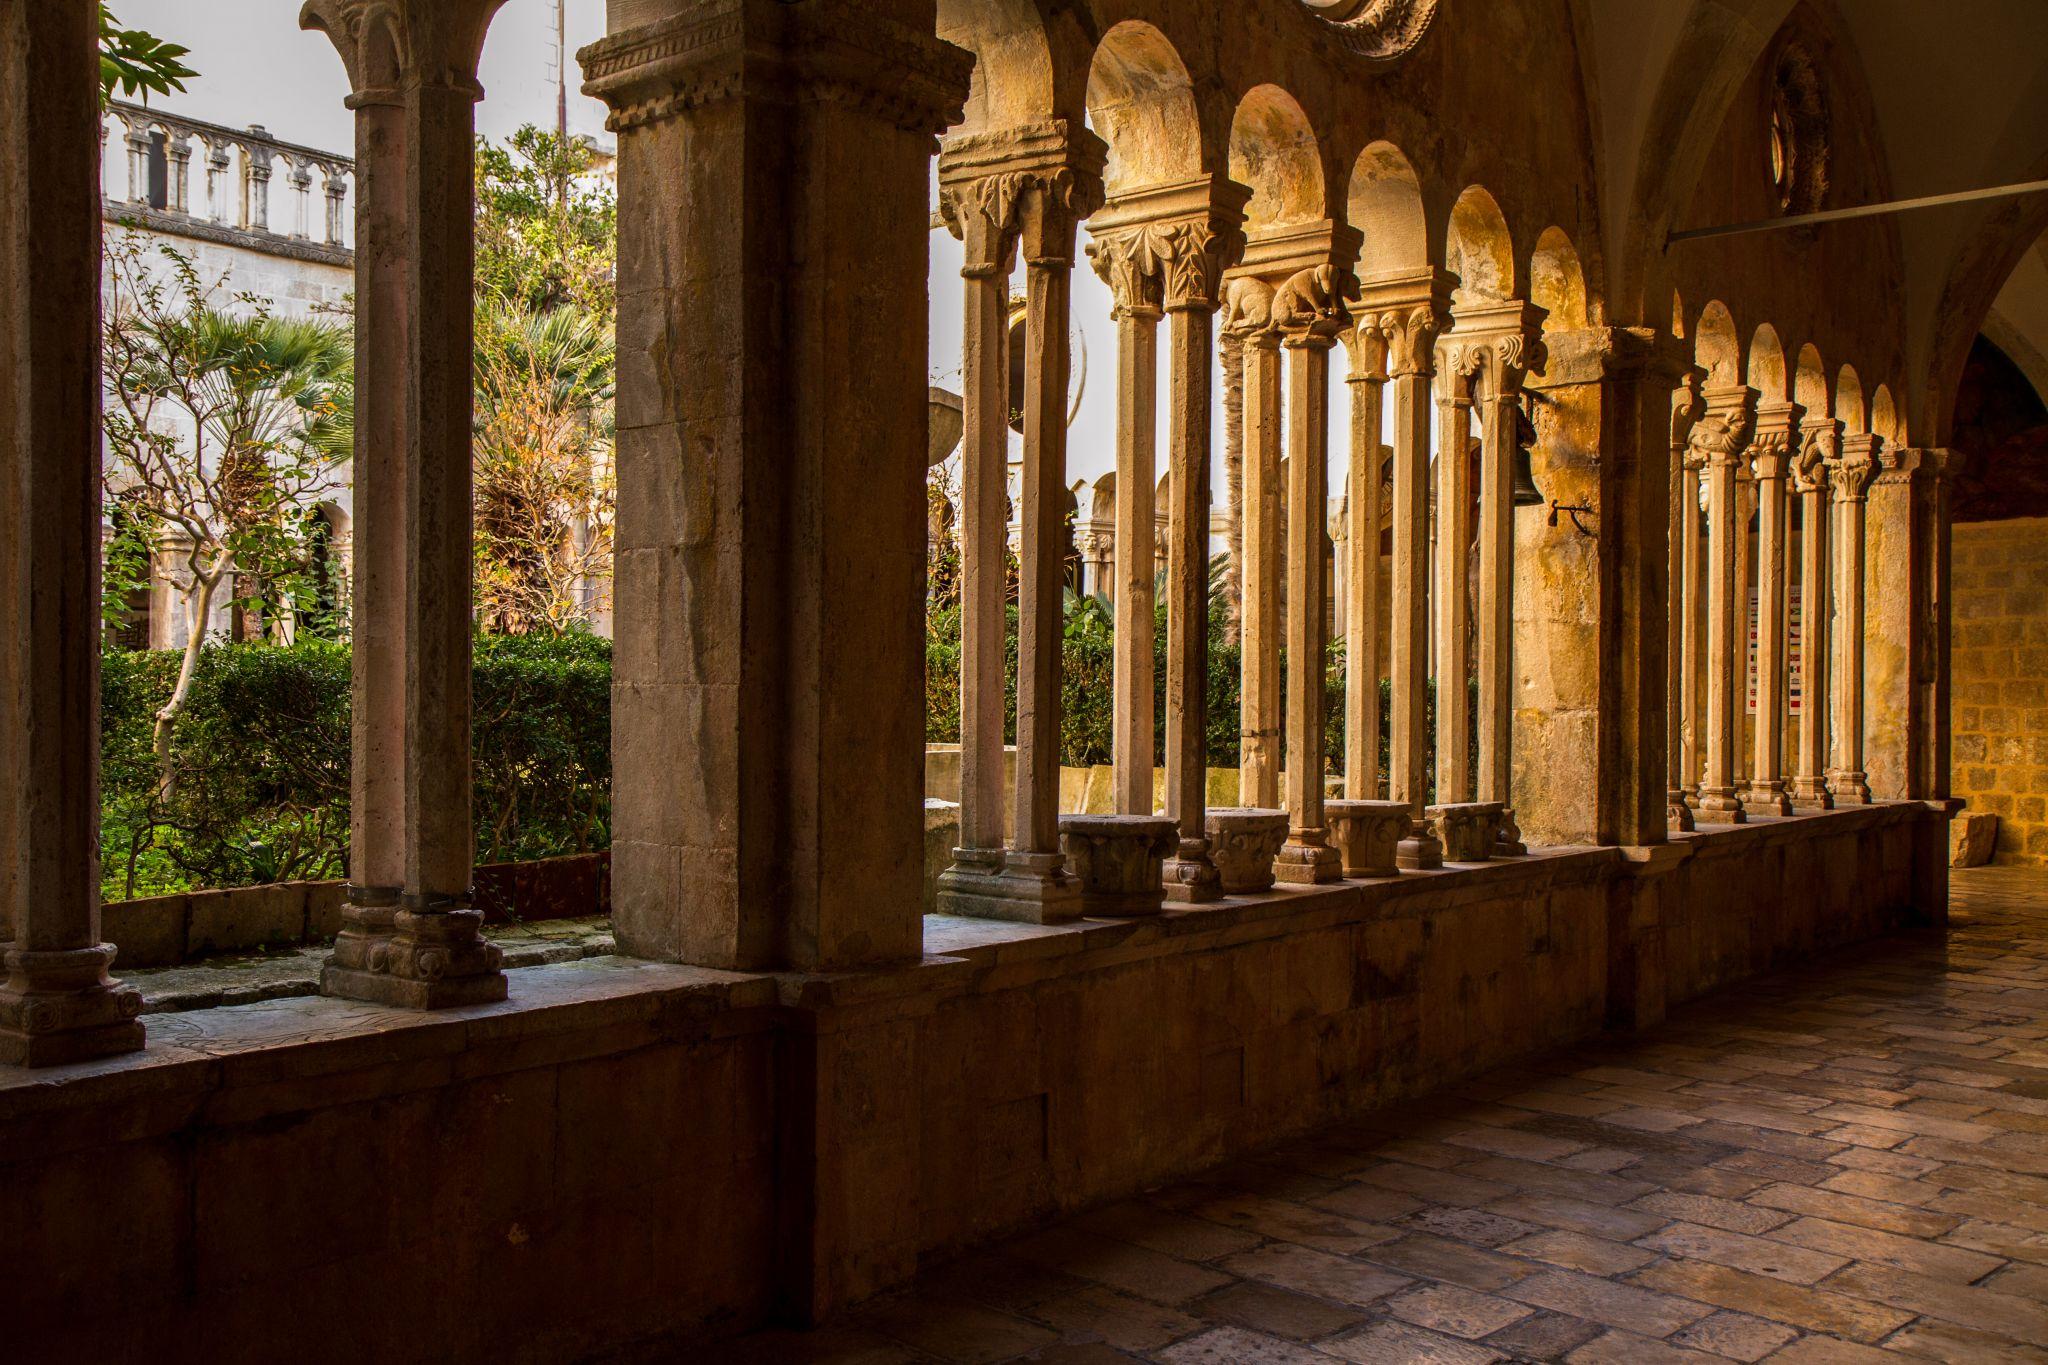 Dubrovnik Franciscian Monastry, Croatia